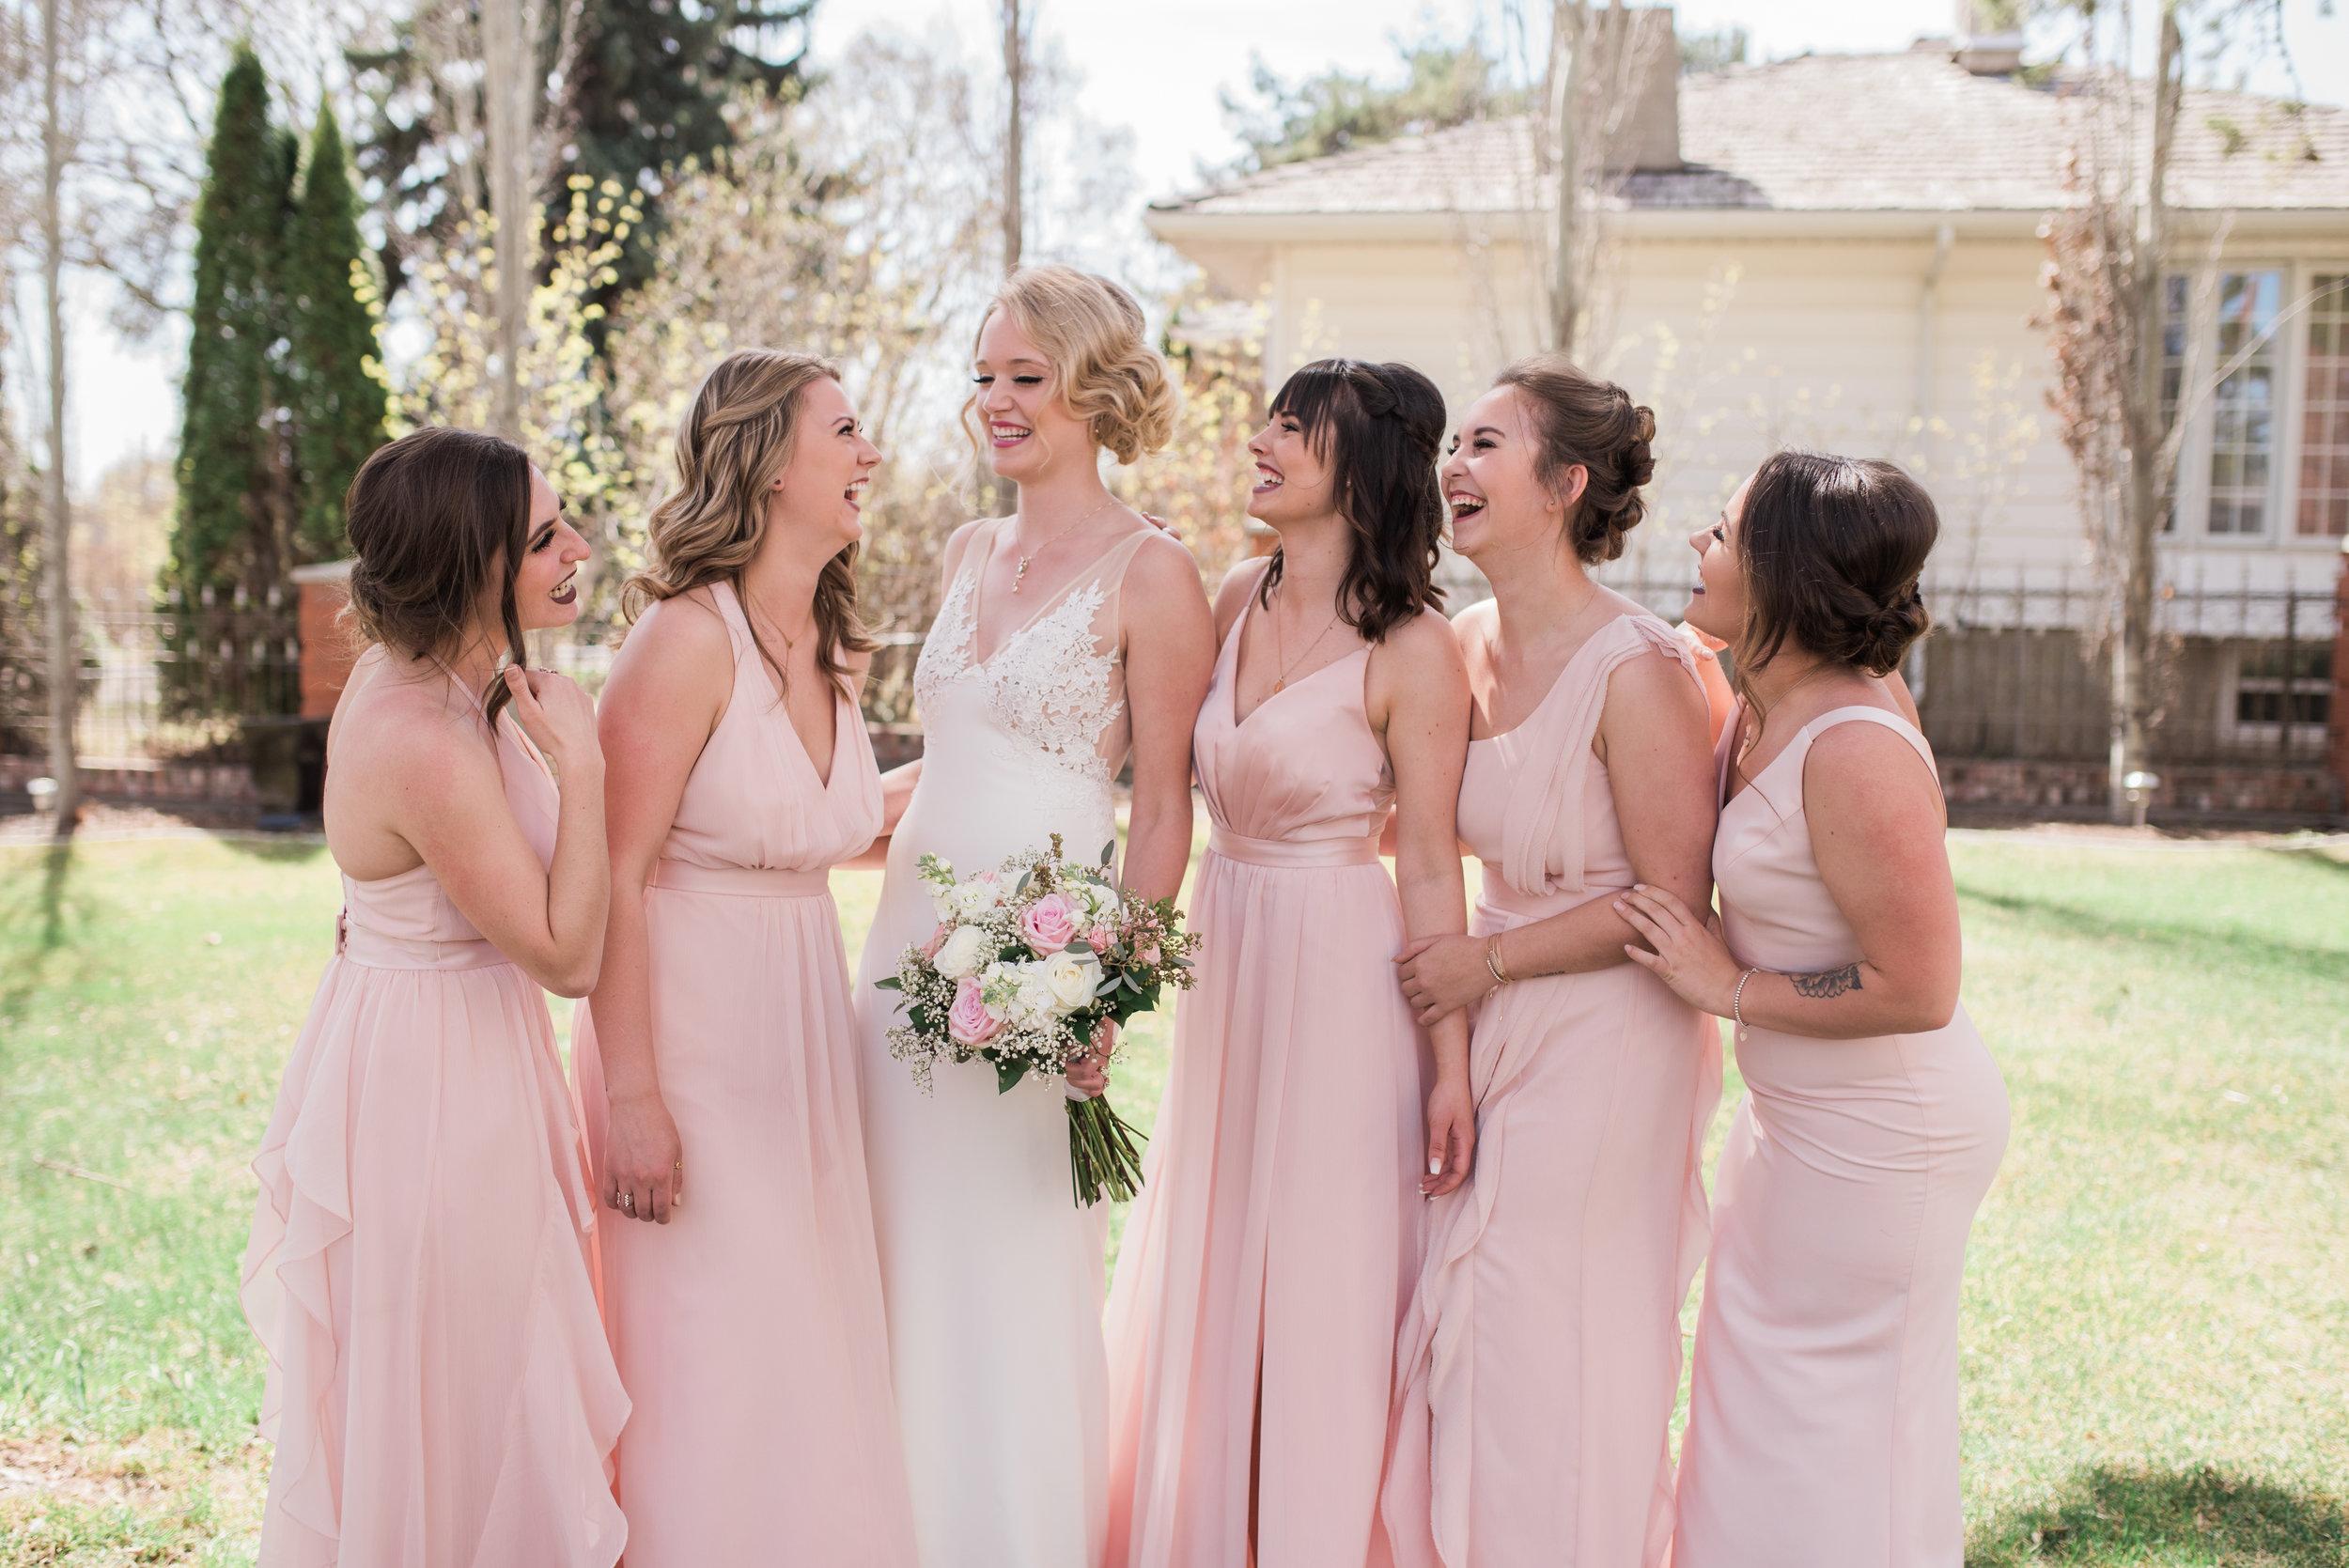 Ali Samantha Wedding 337.jpg